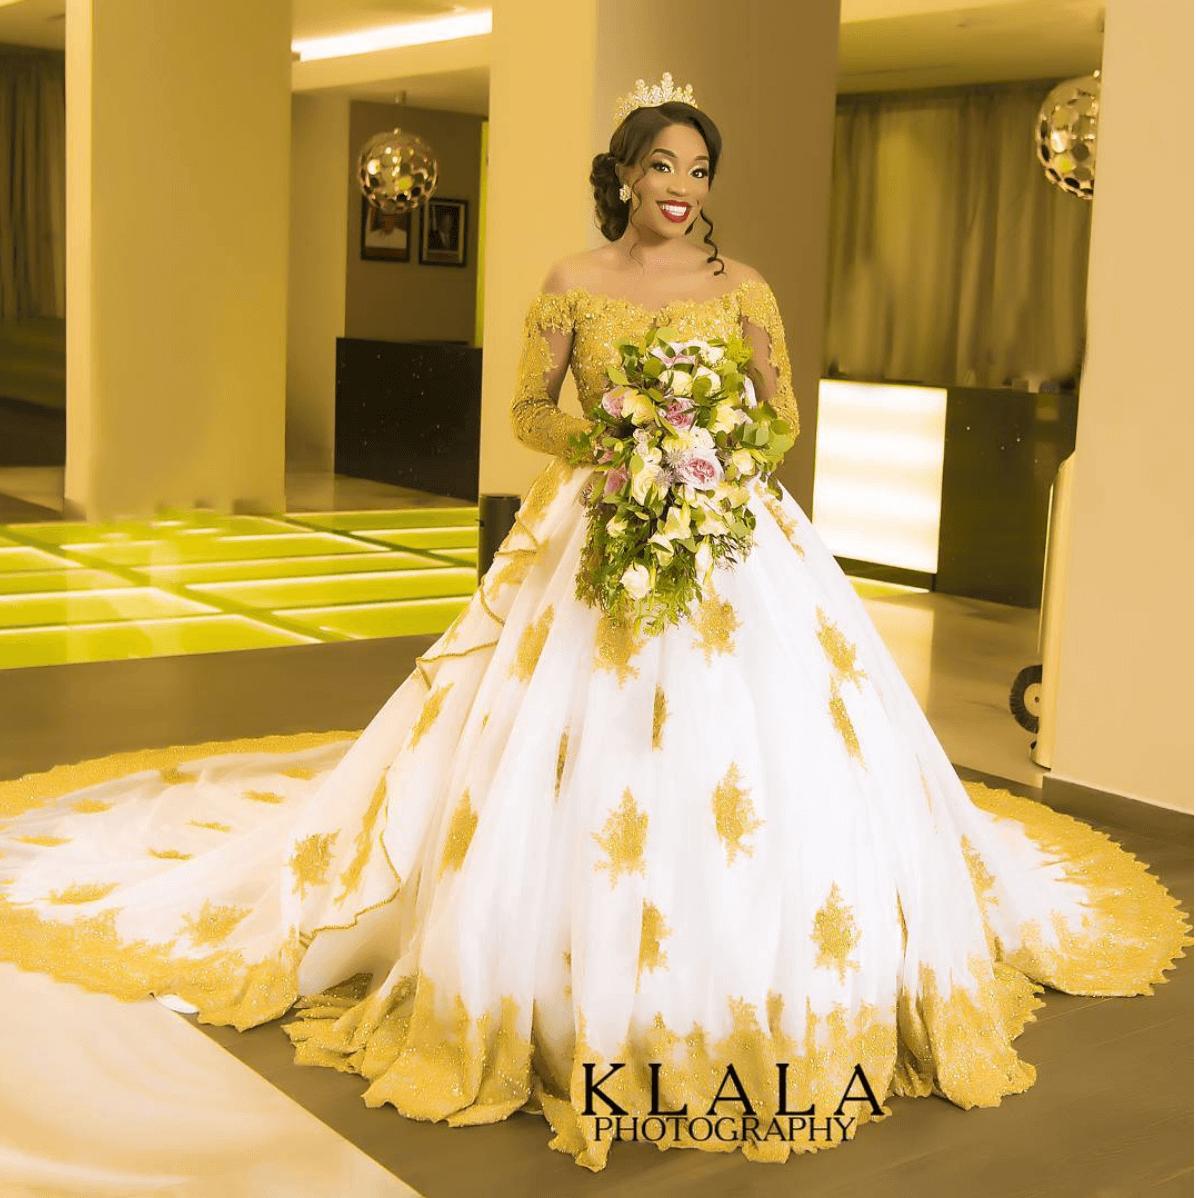 Nigrian Bridal Wedding Dresses: This Gold-Detailed April By Kunbi Wedding Dress Is What